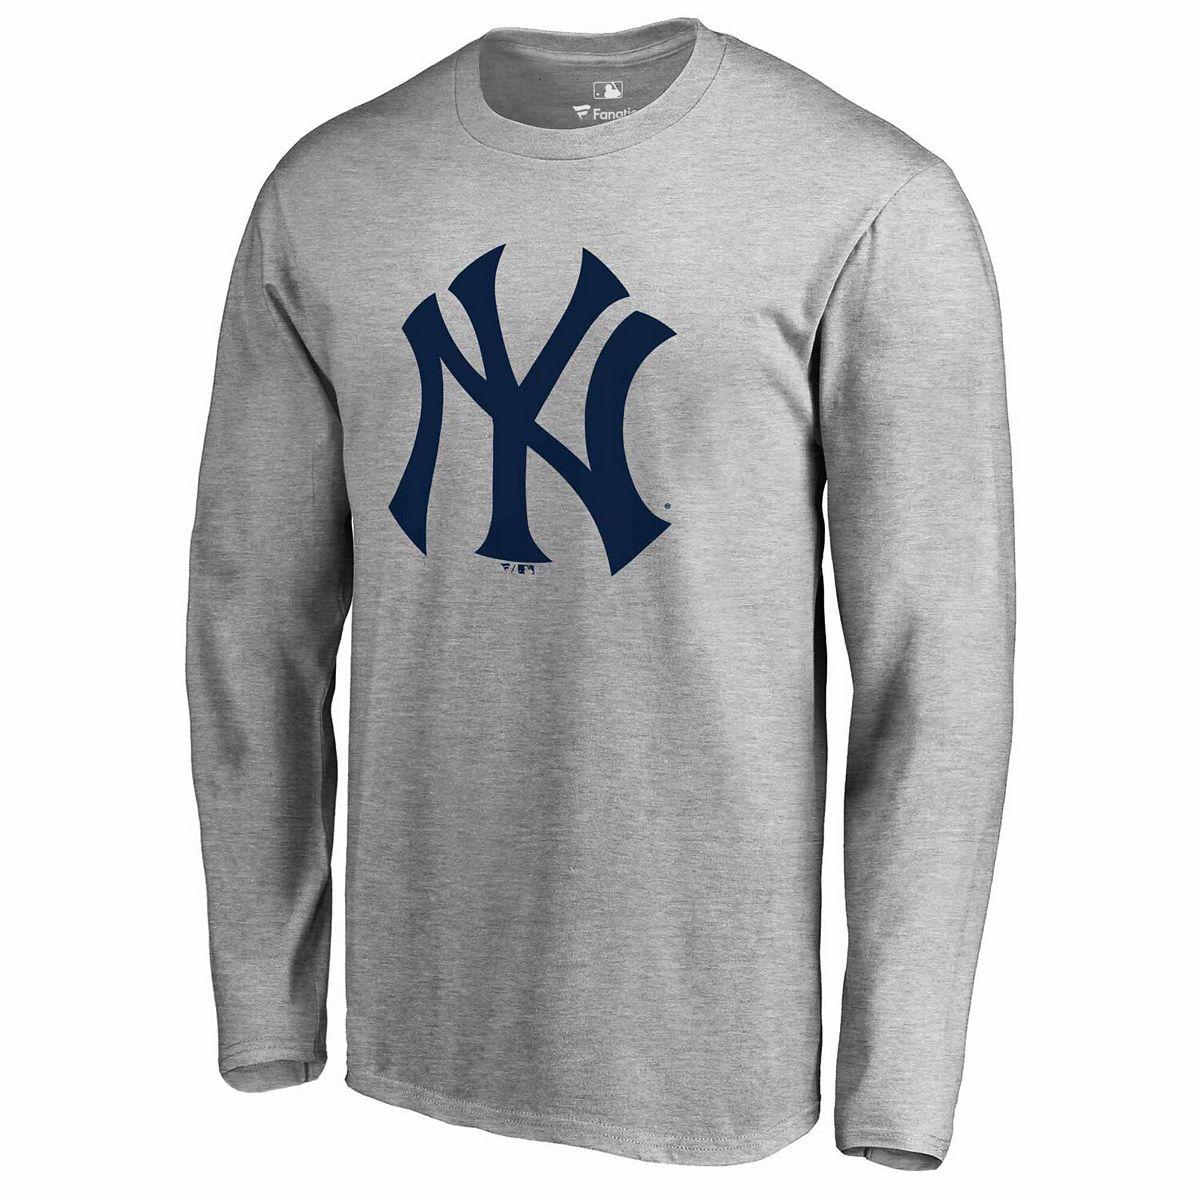 Men's Fanatics Branded Heathered Gray New York Yankees Primary Team Logo T-Shirt AyNb6